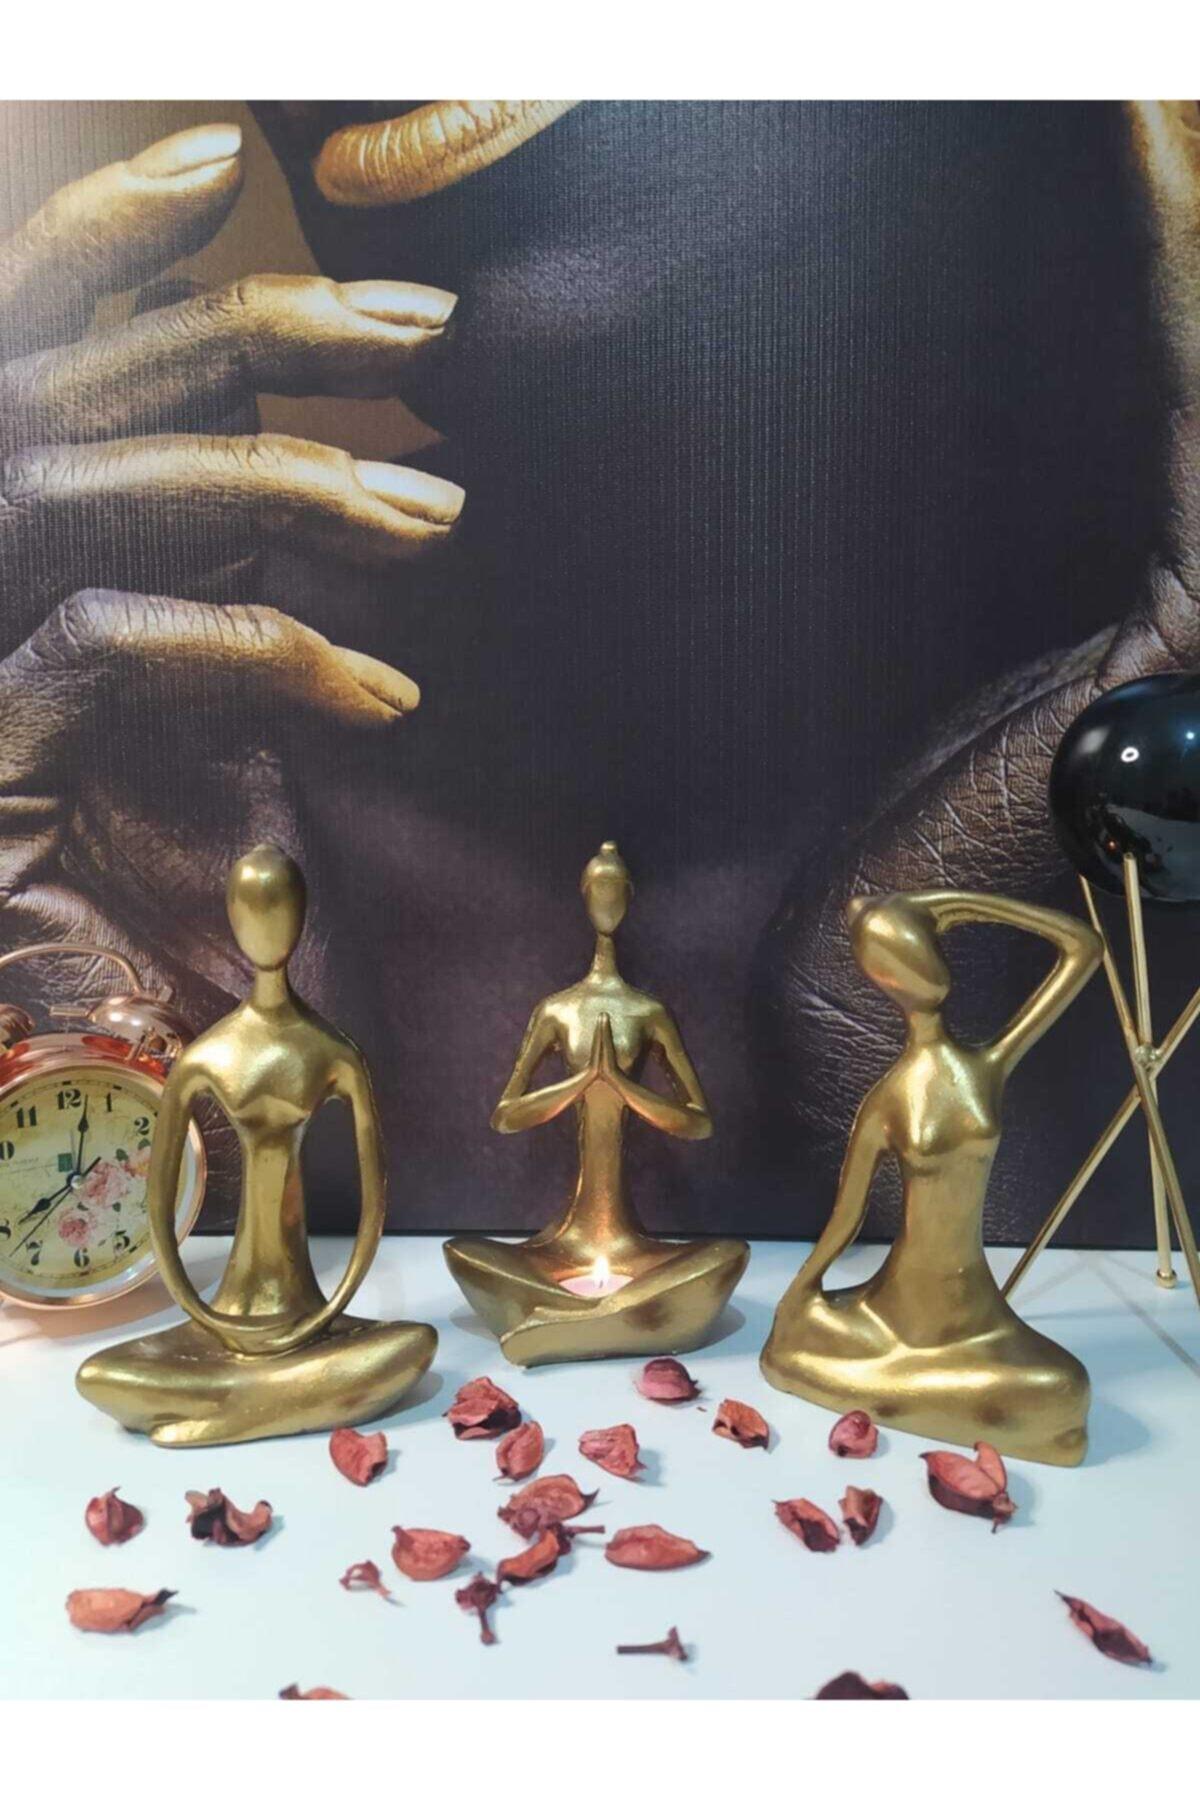 Decorative Yogacı Girls 3'lü Suit Accessories Dry Flower Flowers Modern Minimalist Literary Vases for Home Decoration